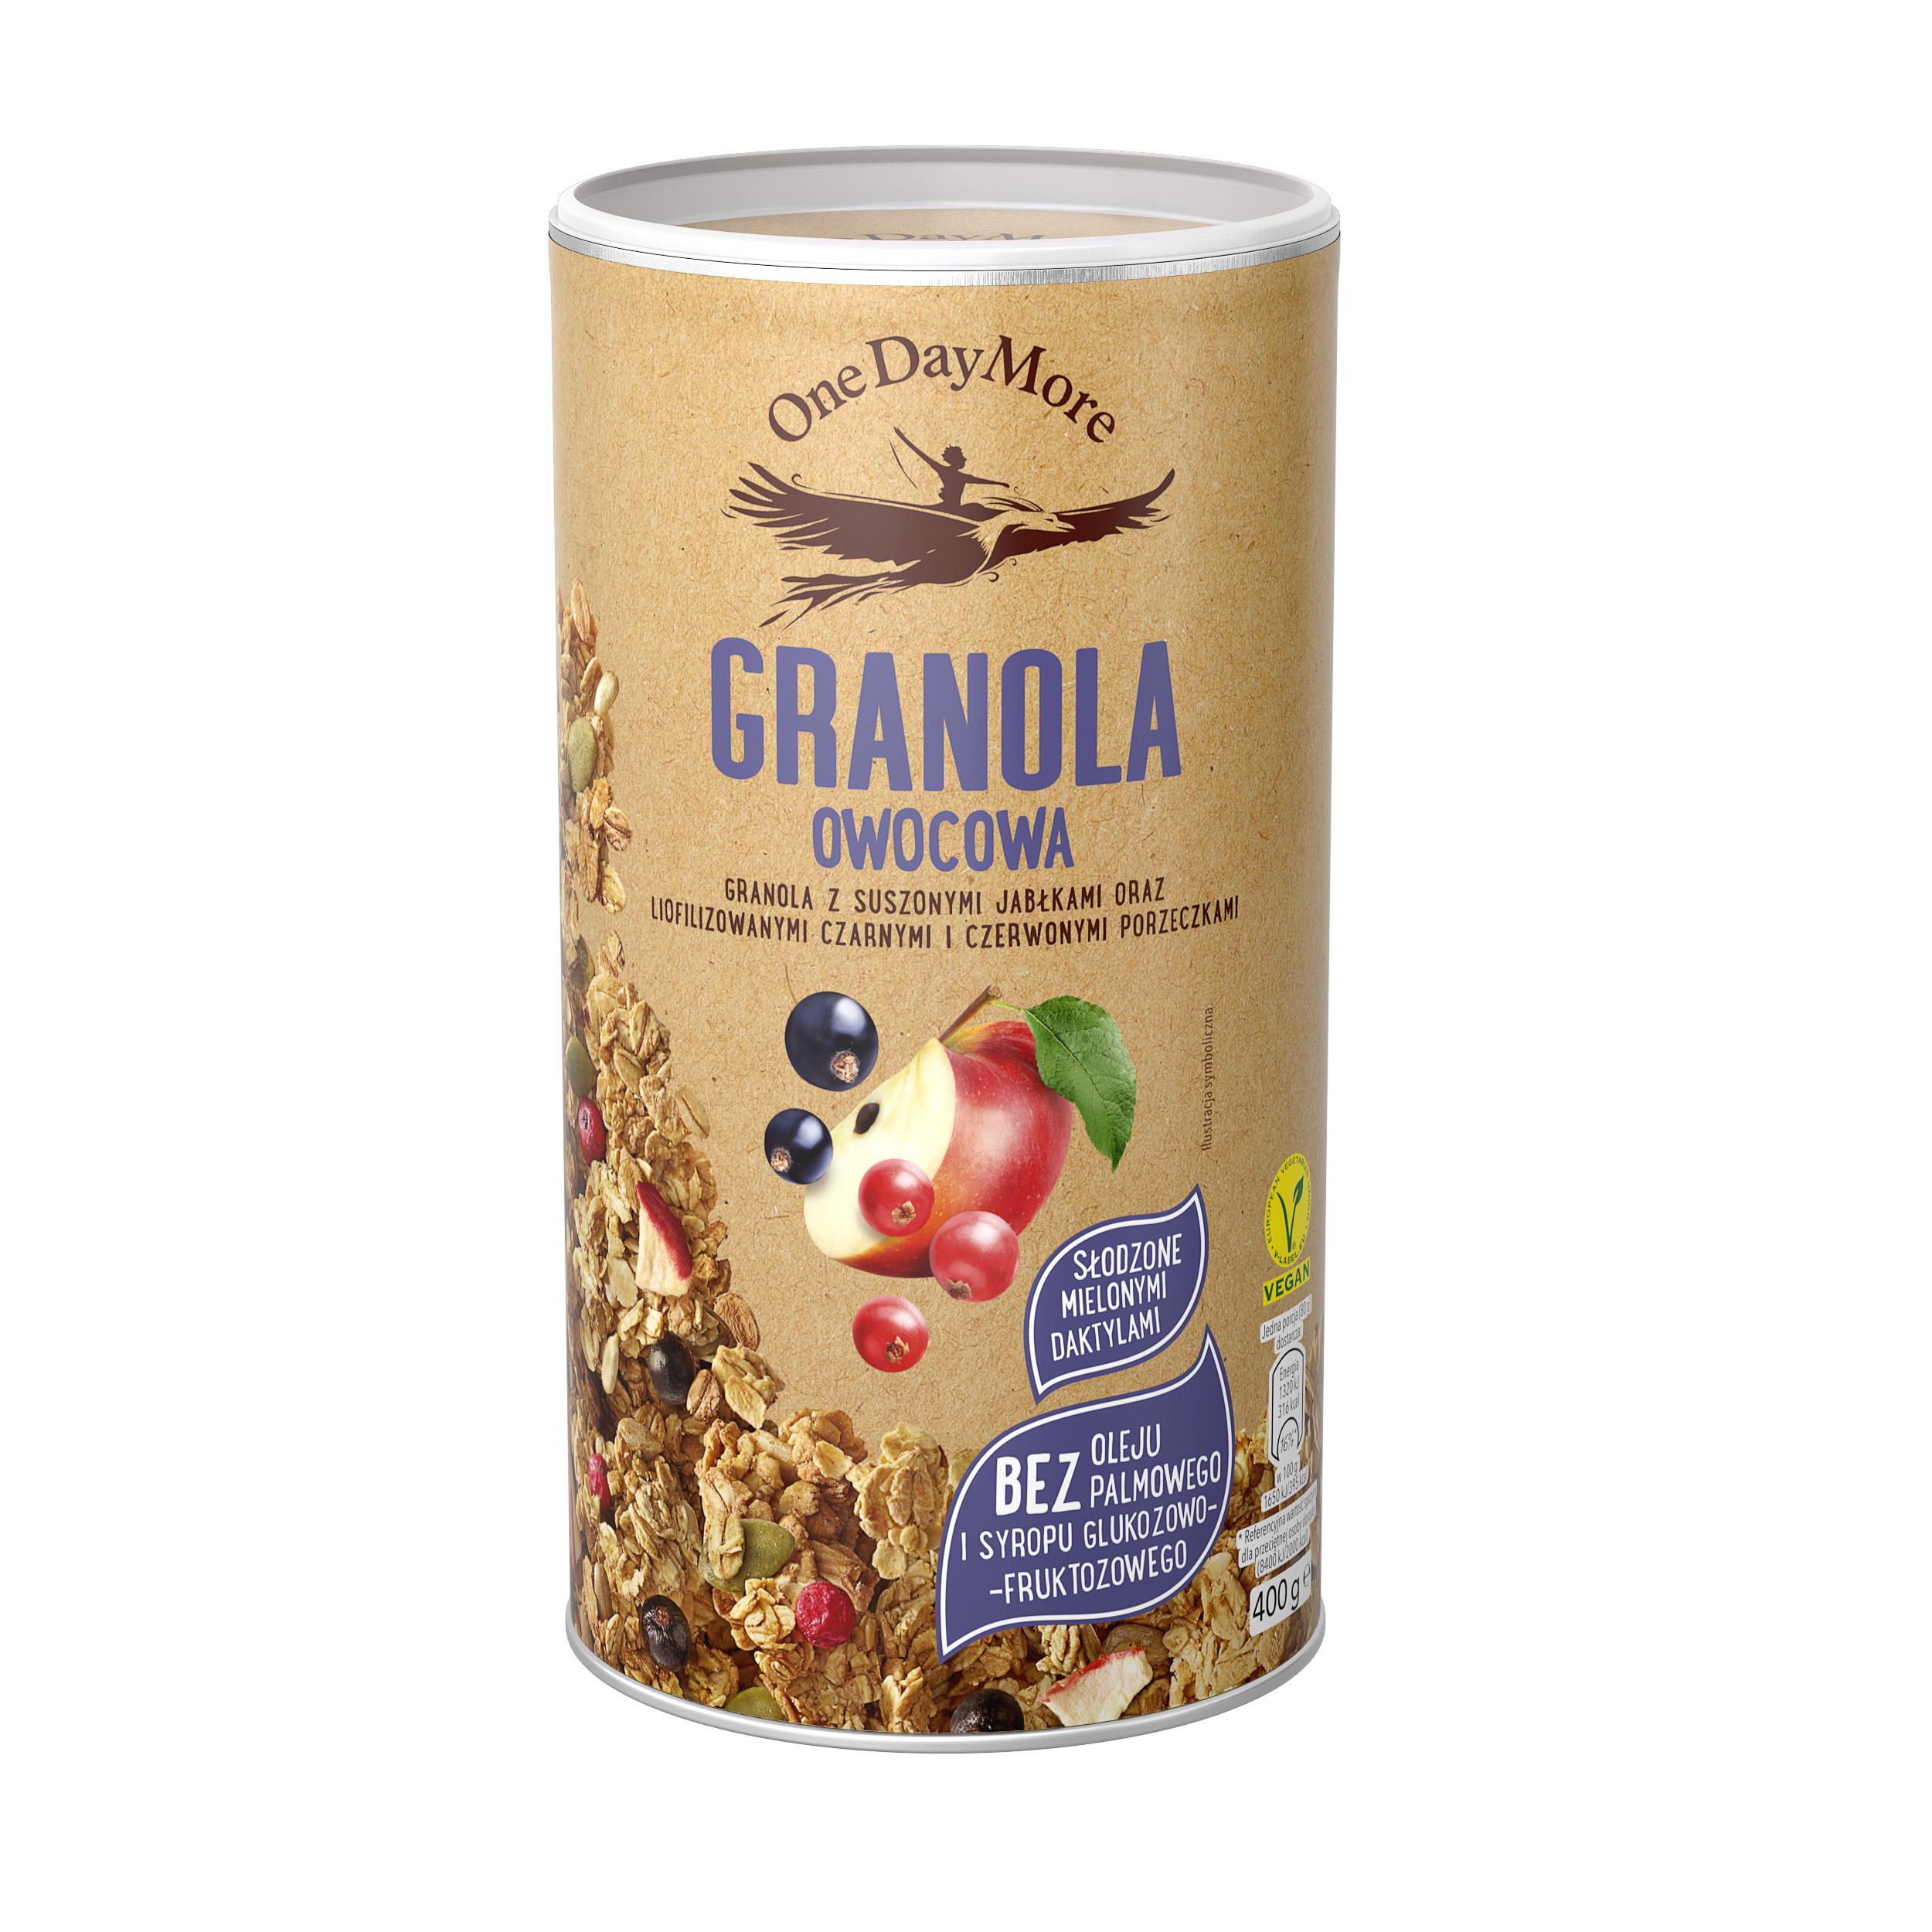 One Day More Granola Owocowa